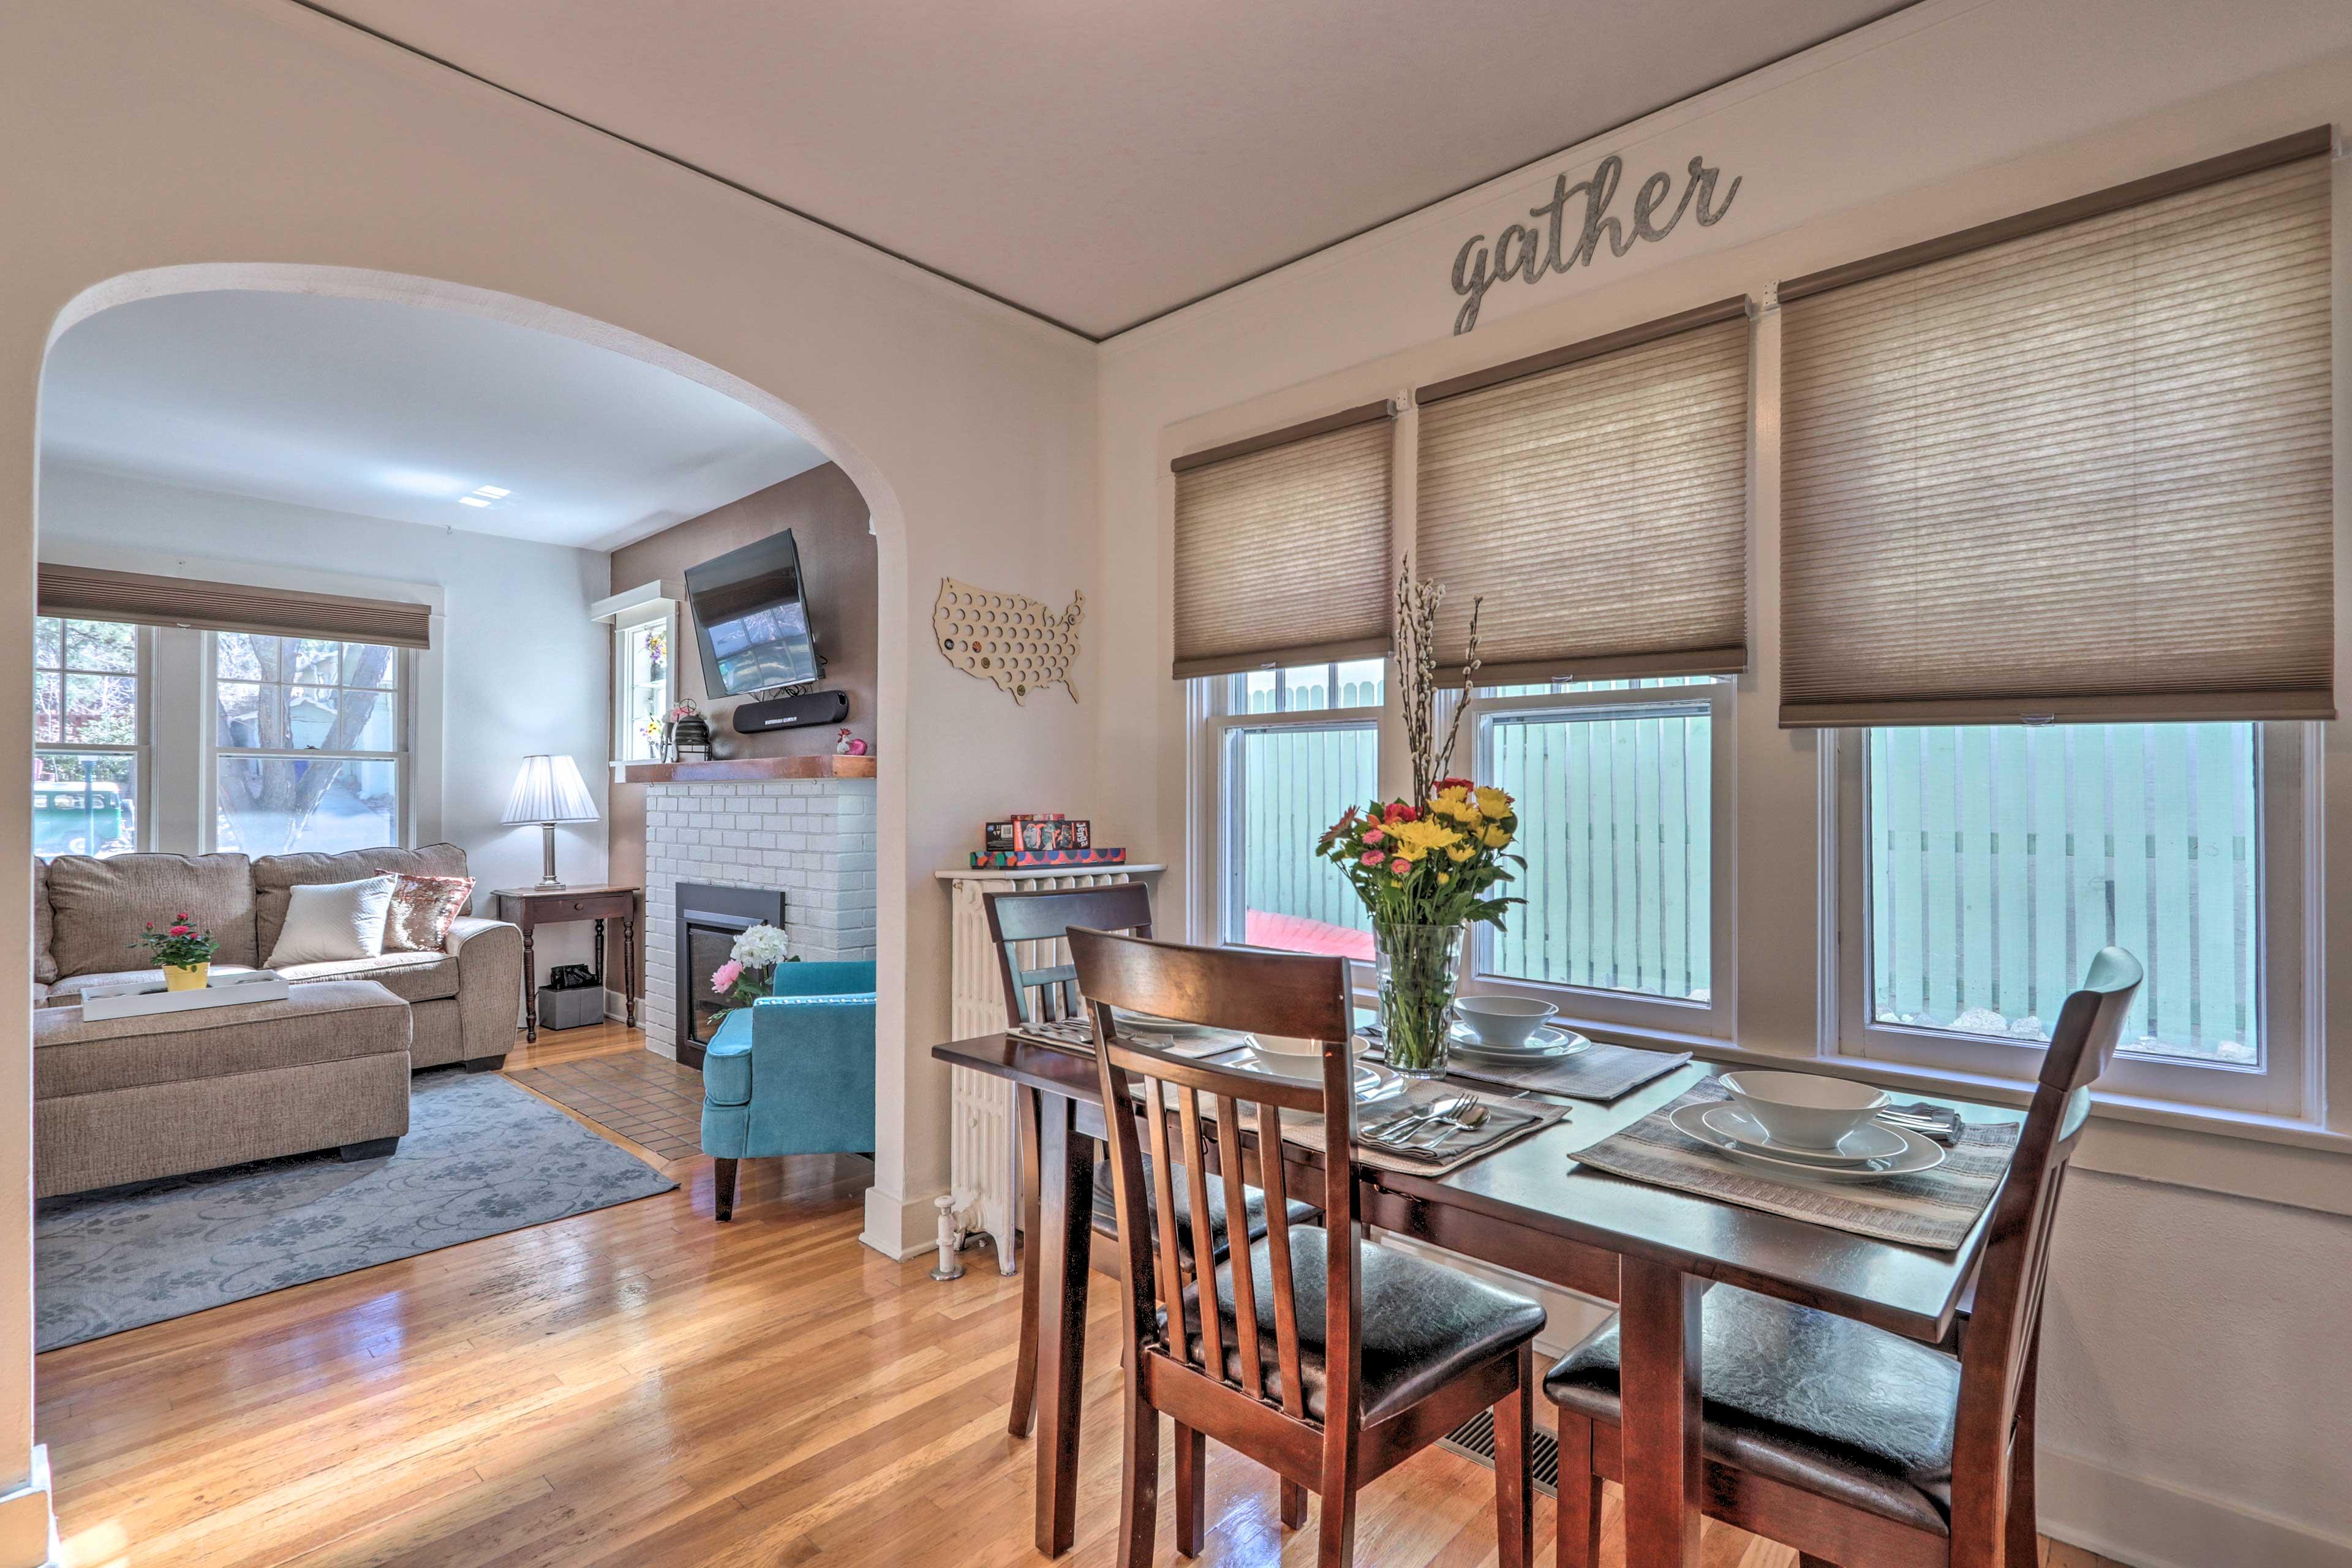 Book your Prescott getaway to this 2-bedroom, 2-bath vacation rental house!